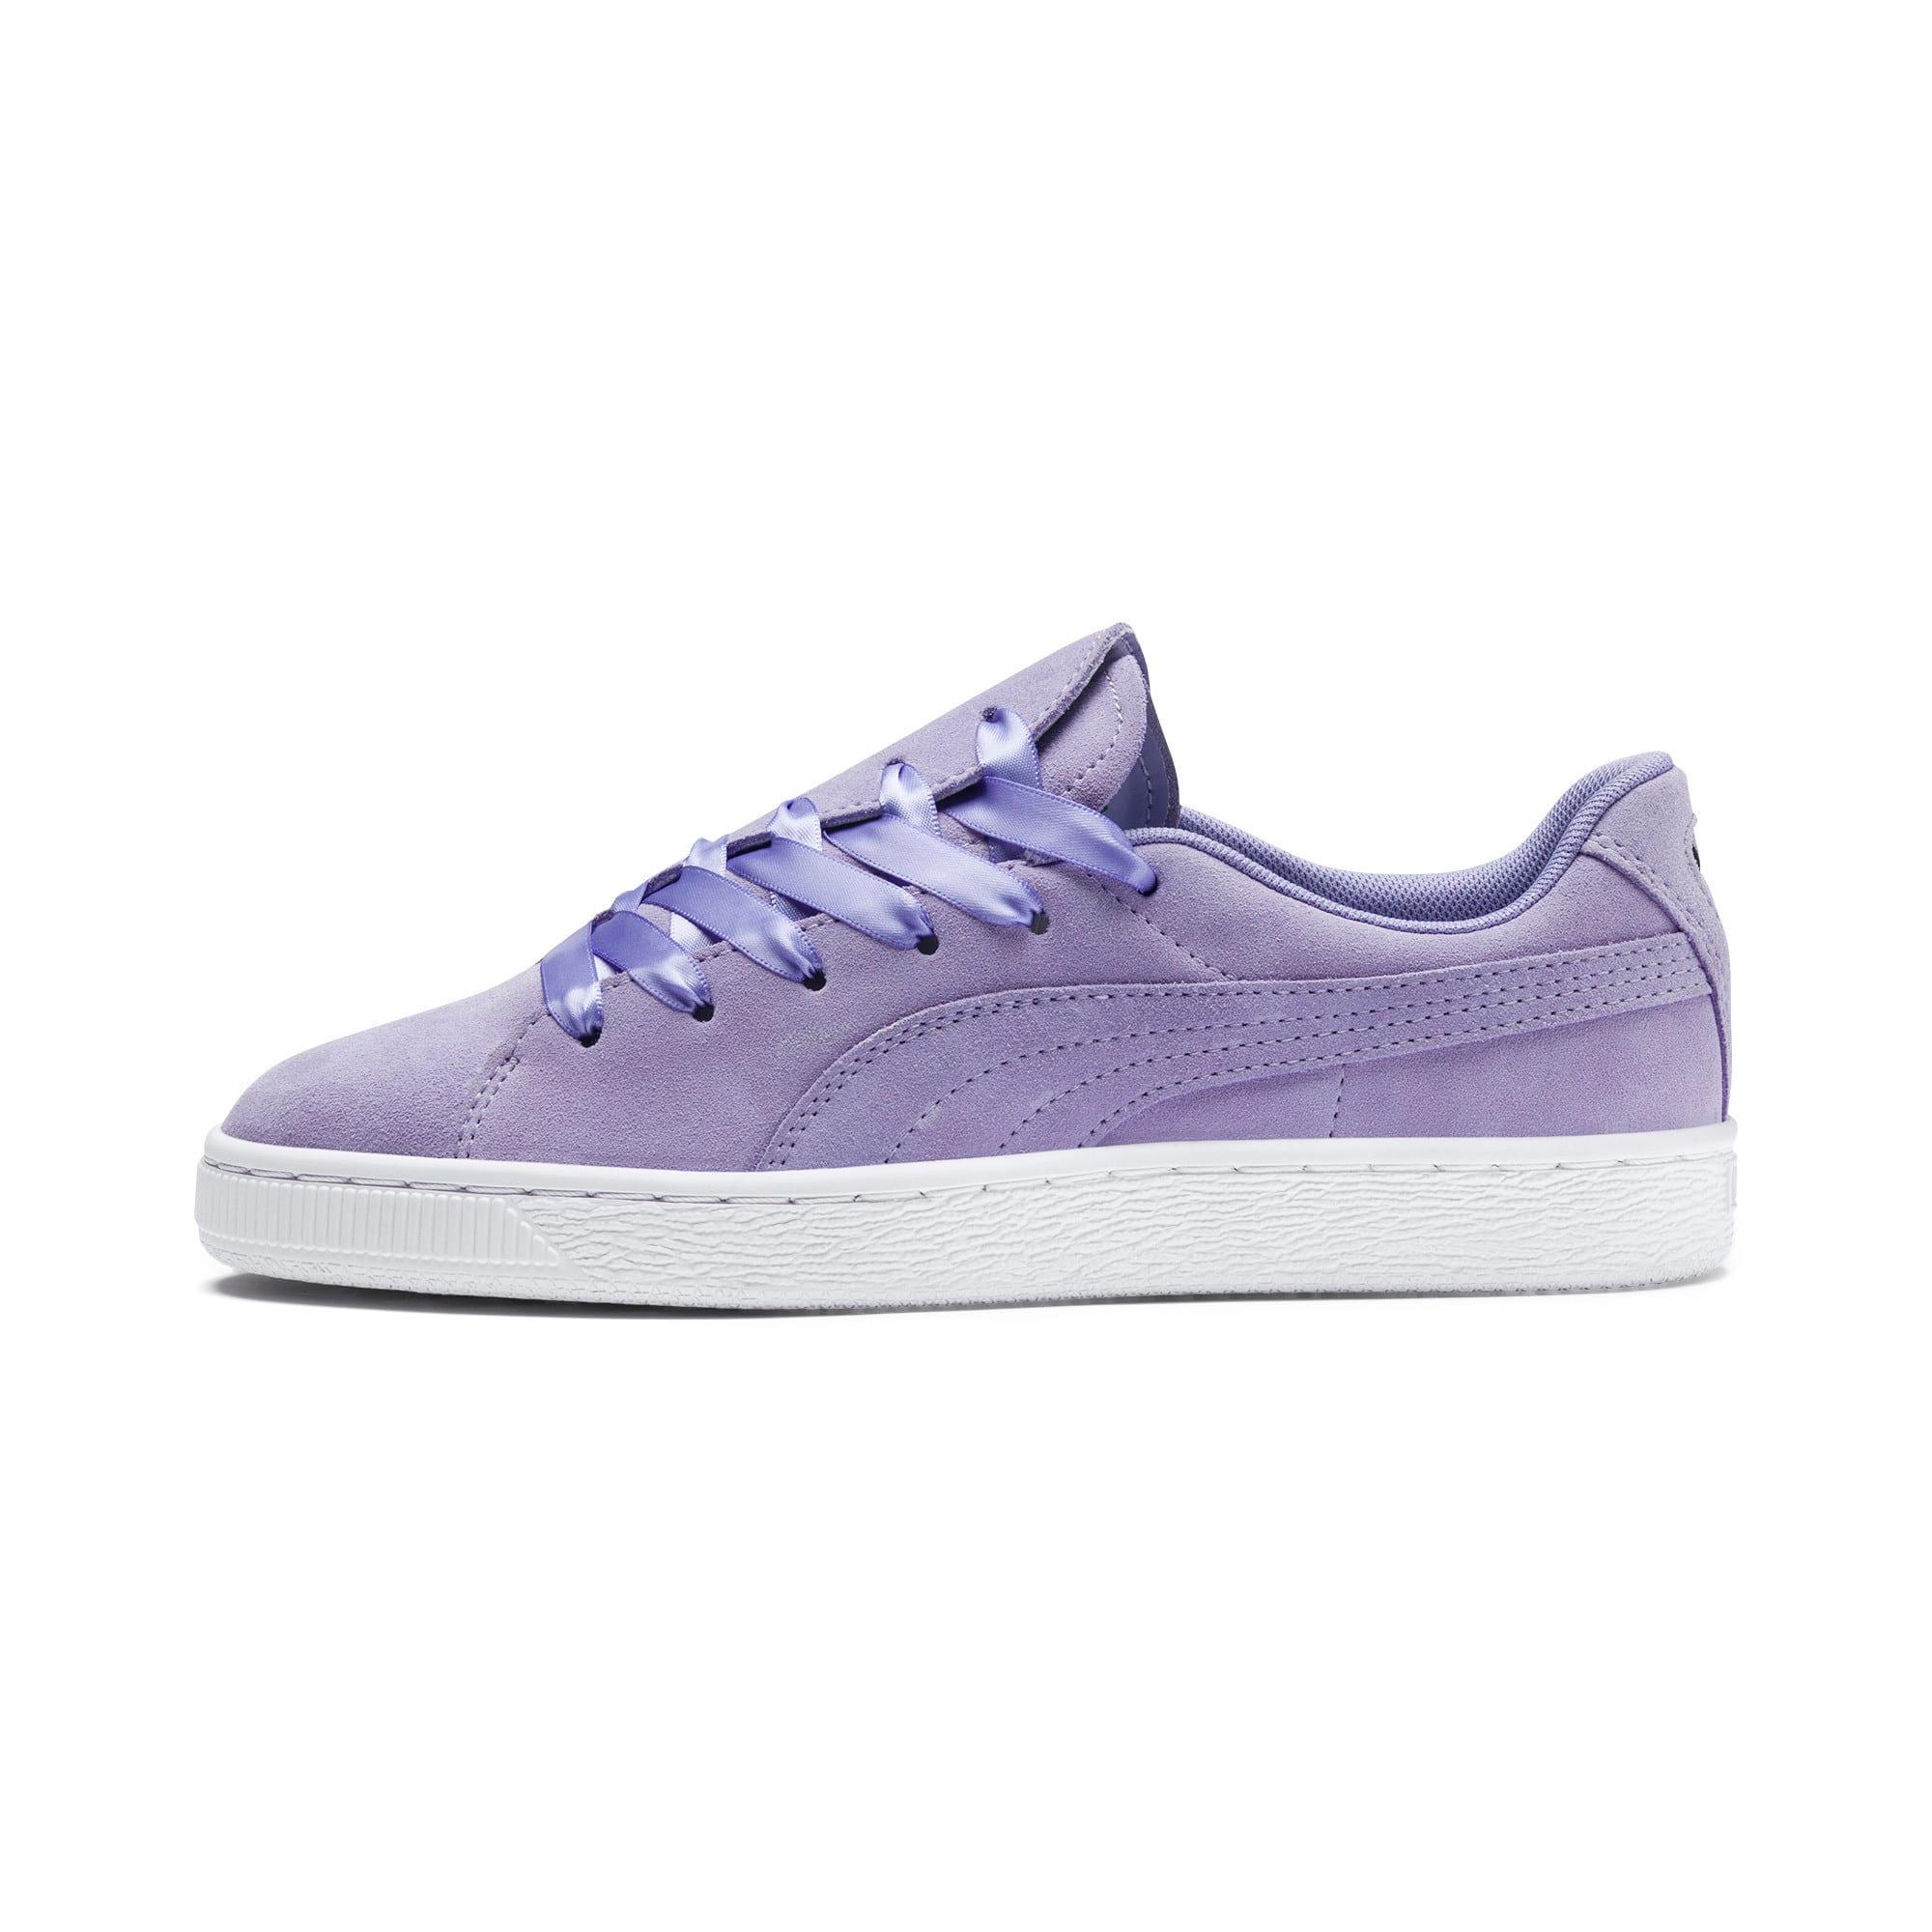 Thumbnail 1 of Suede Crush Women's Sneakers, Sweet Lavender, medium